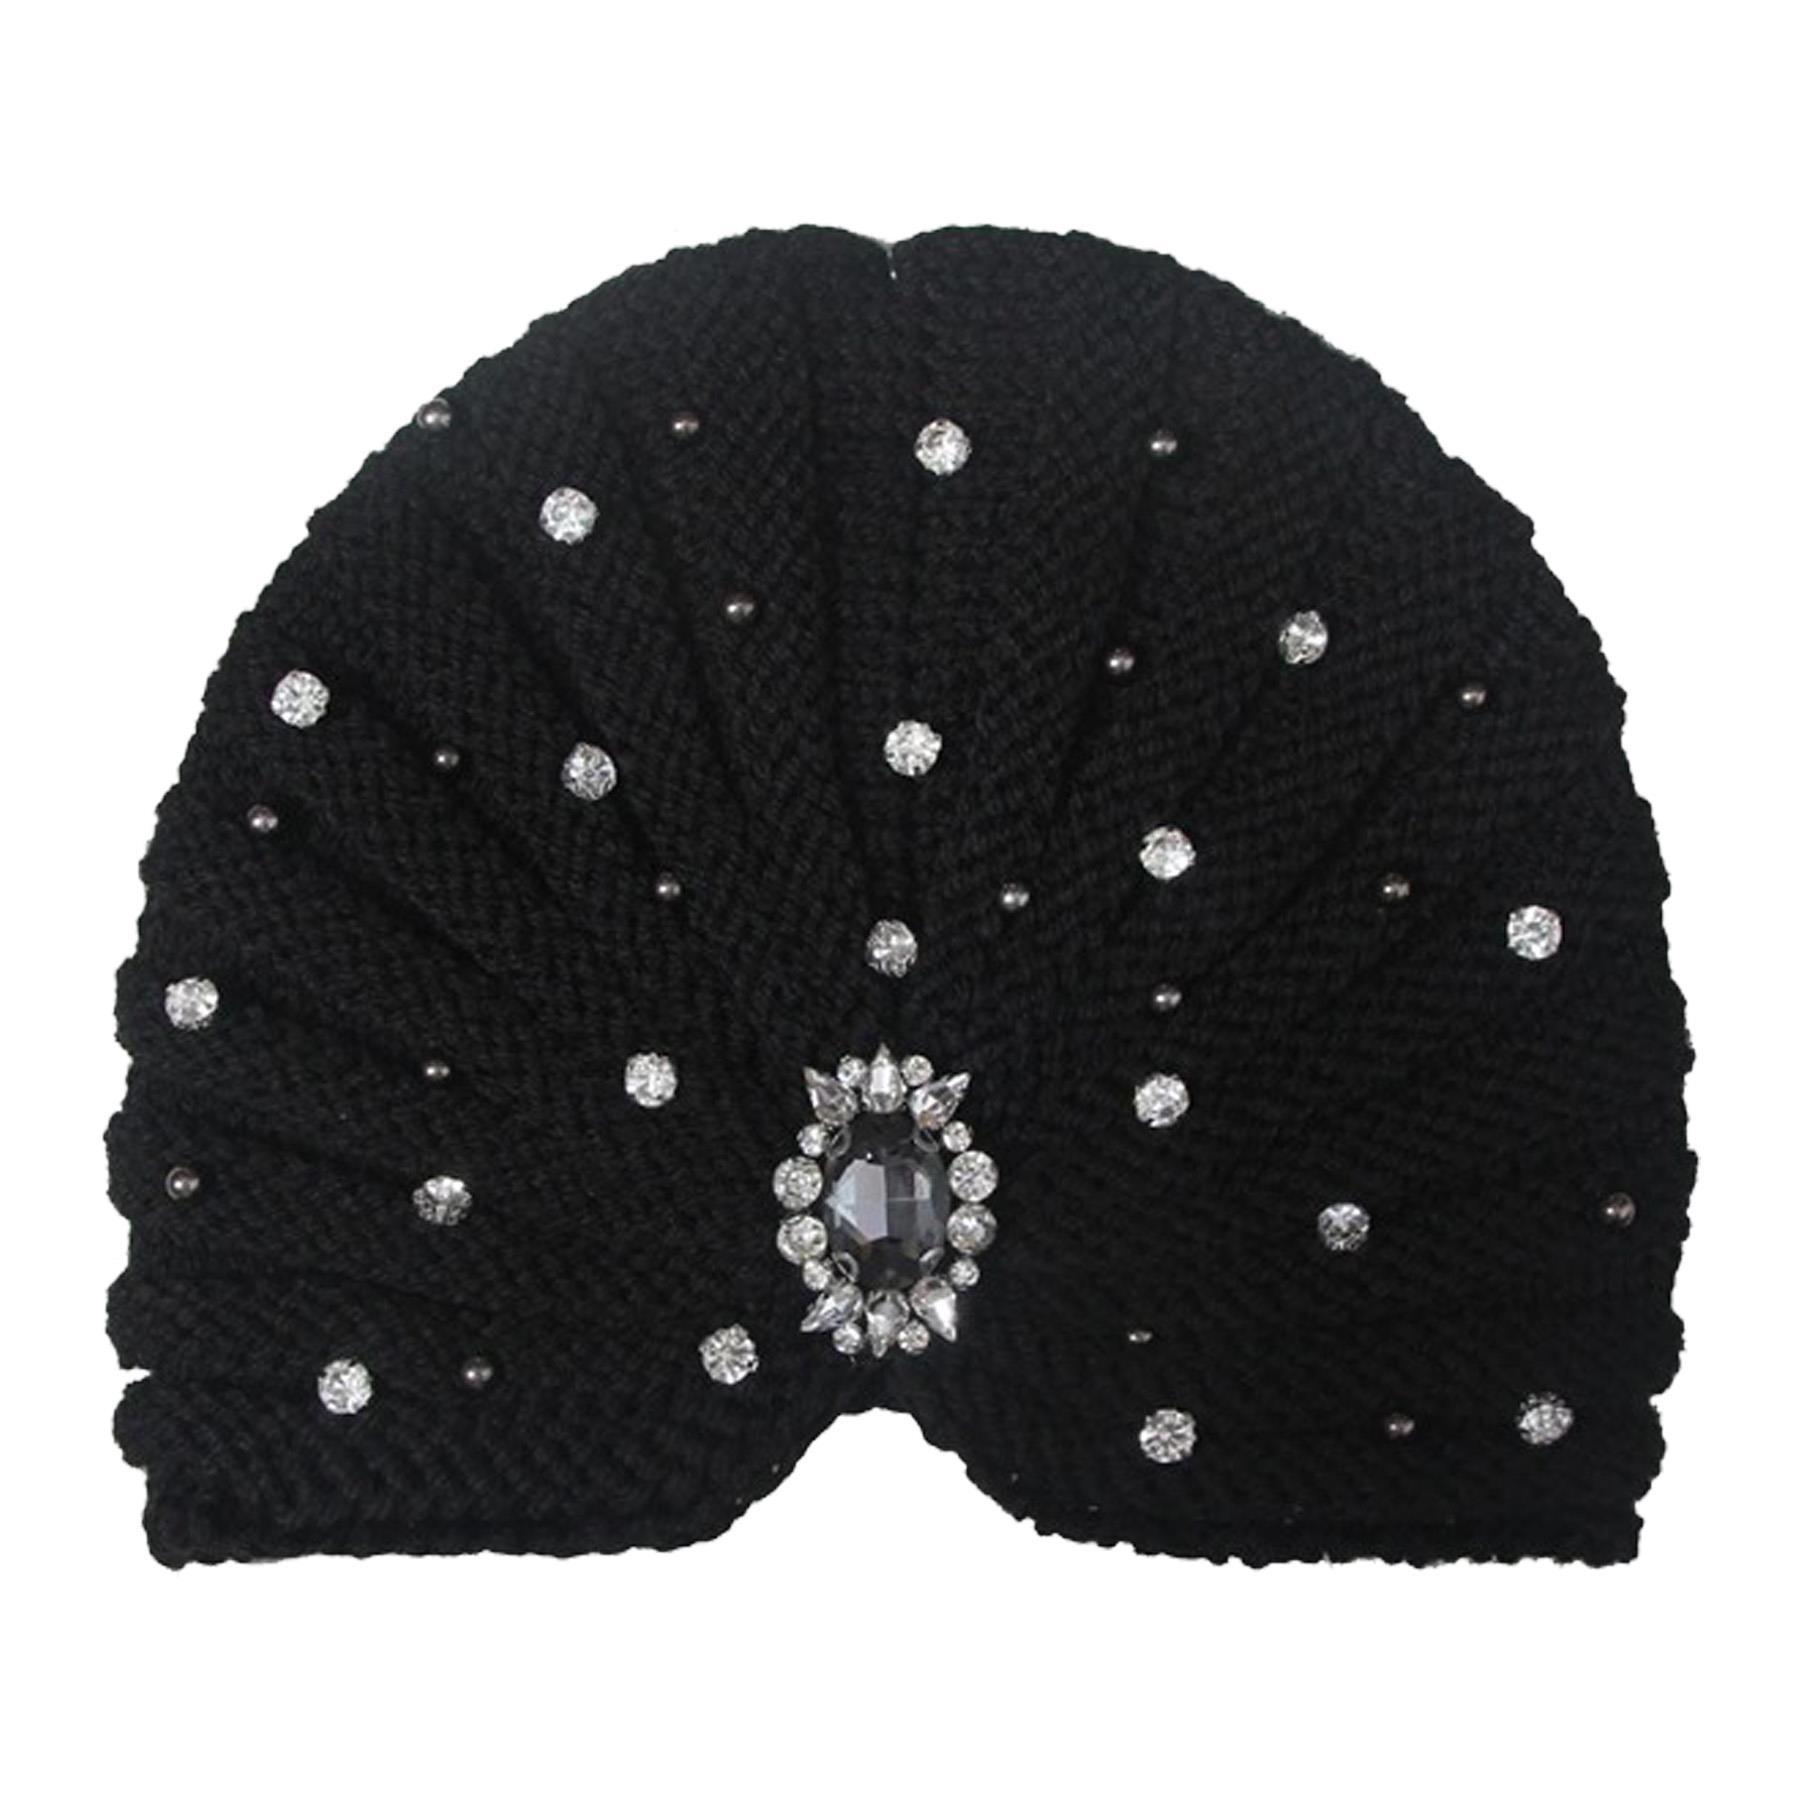 New-Women-s-Pleated-Knitted-Acrylic-Jewel-Detail-Headwear-Turban-Cap thumbnail 16